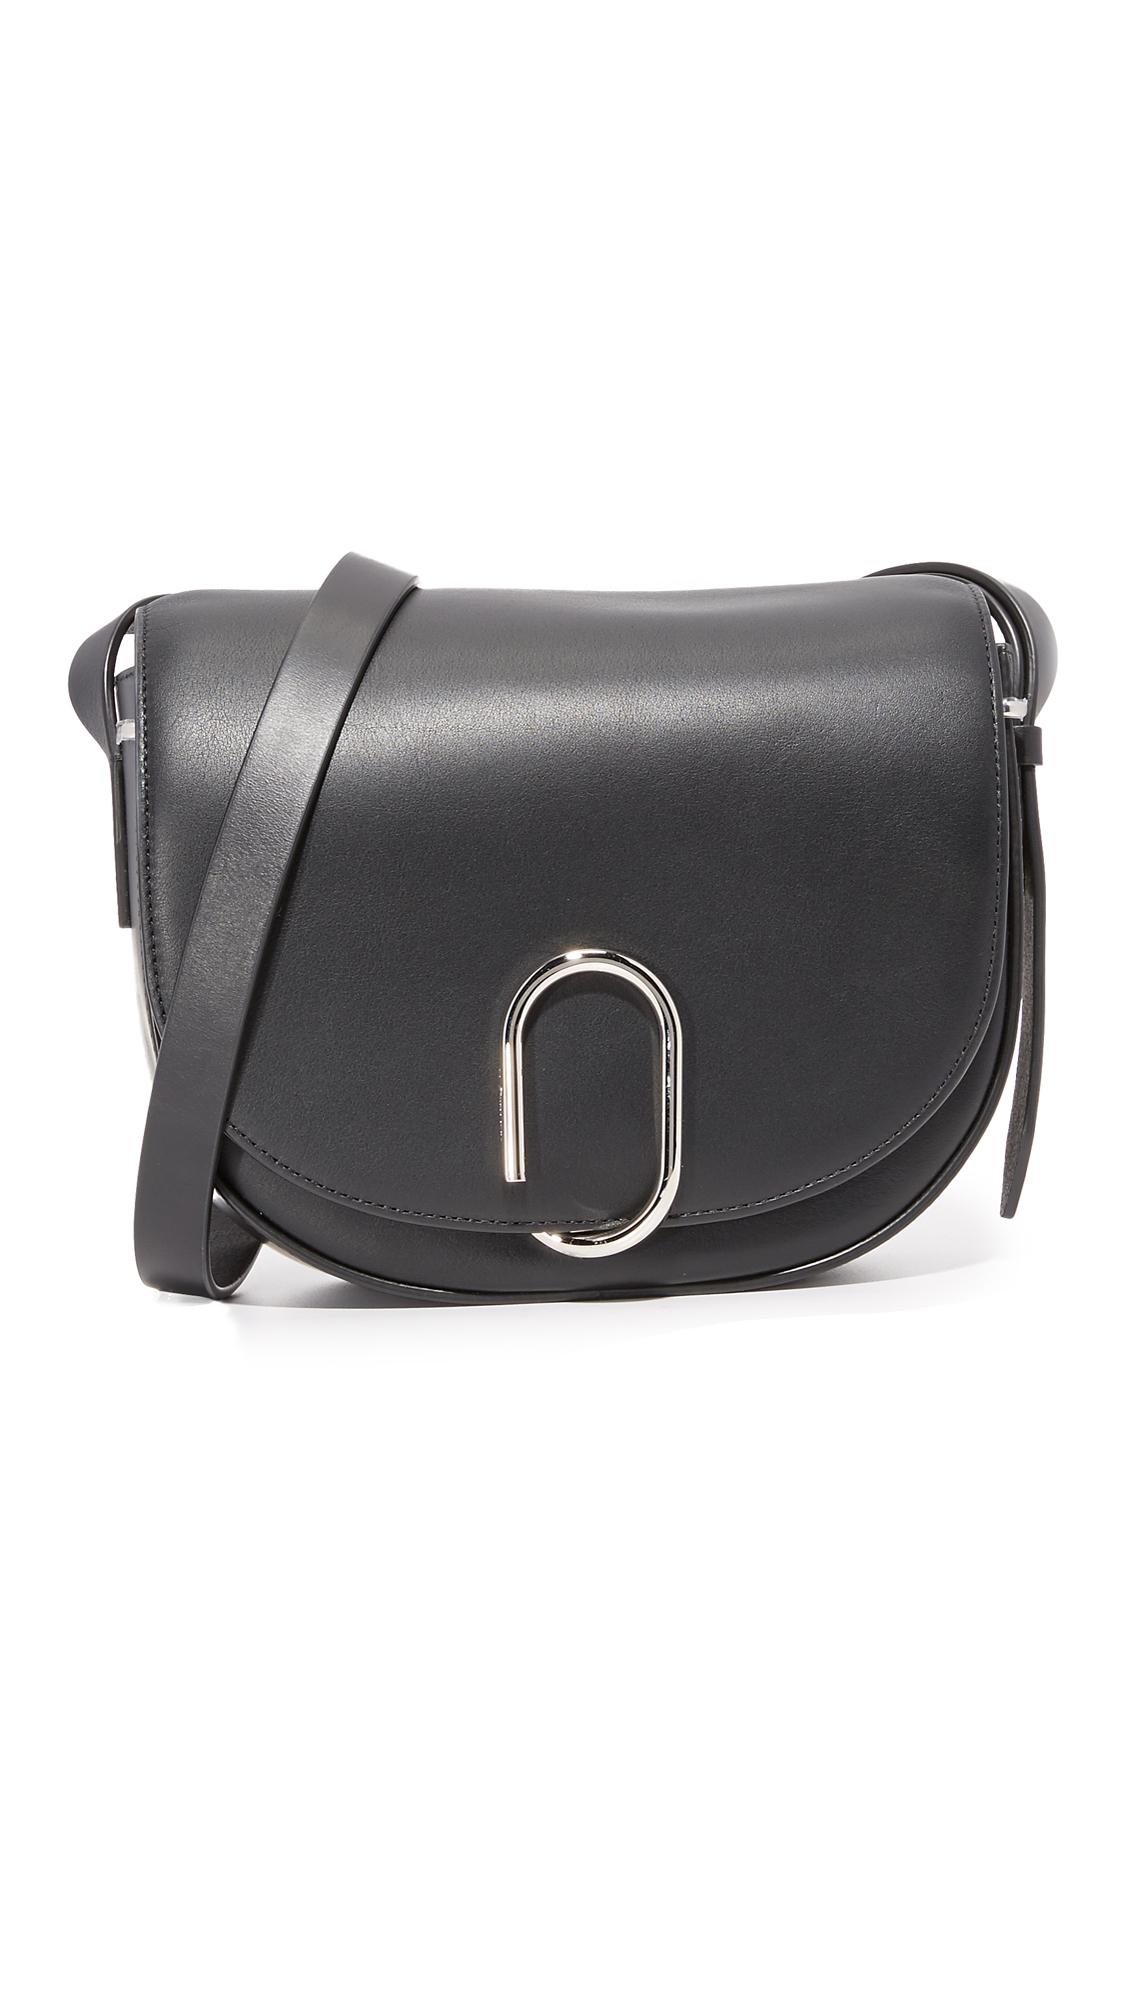 3.1 Phillip Lim Alix Saddle Cross Body Bag - Black